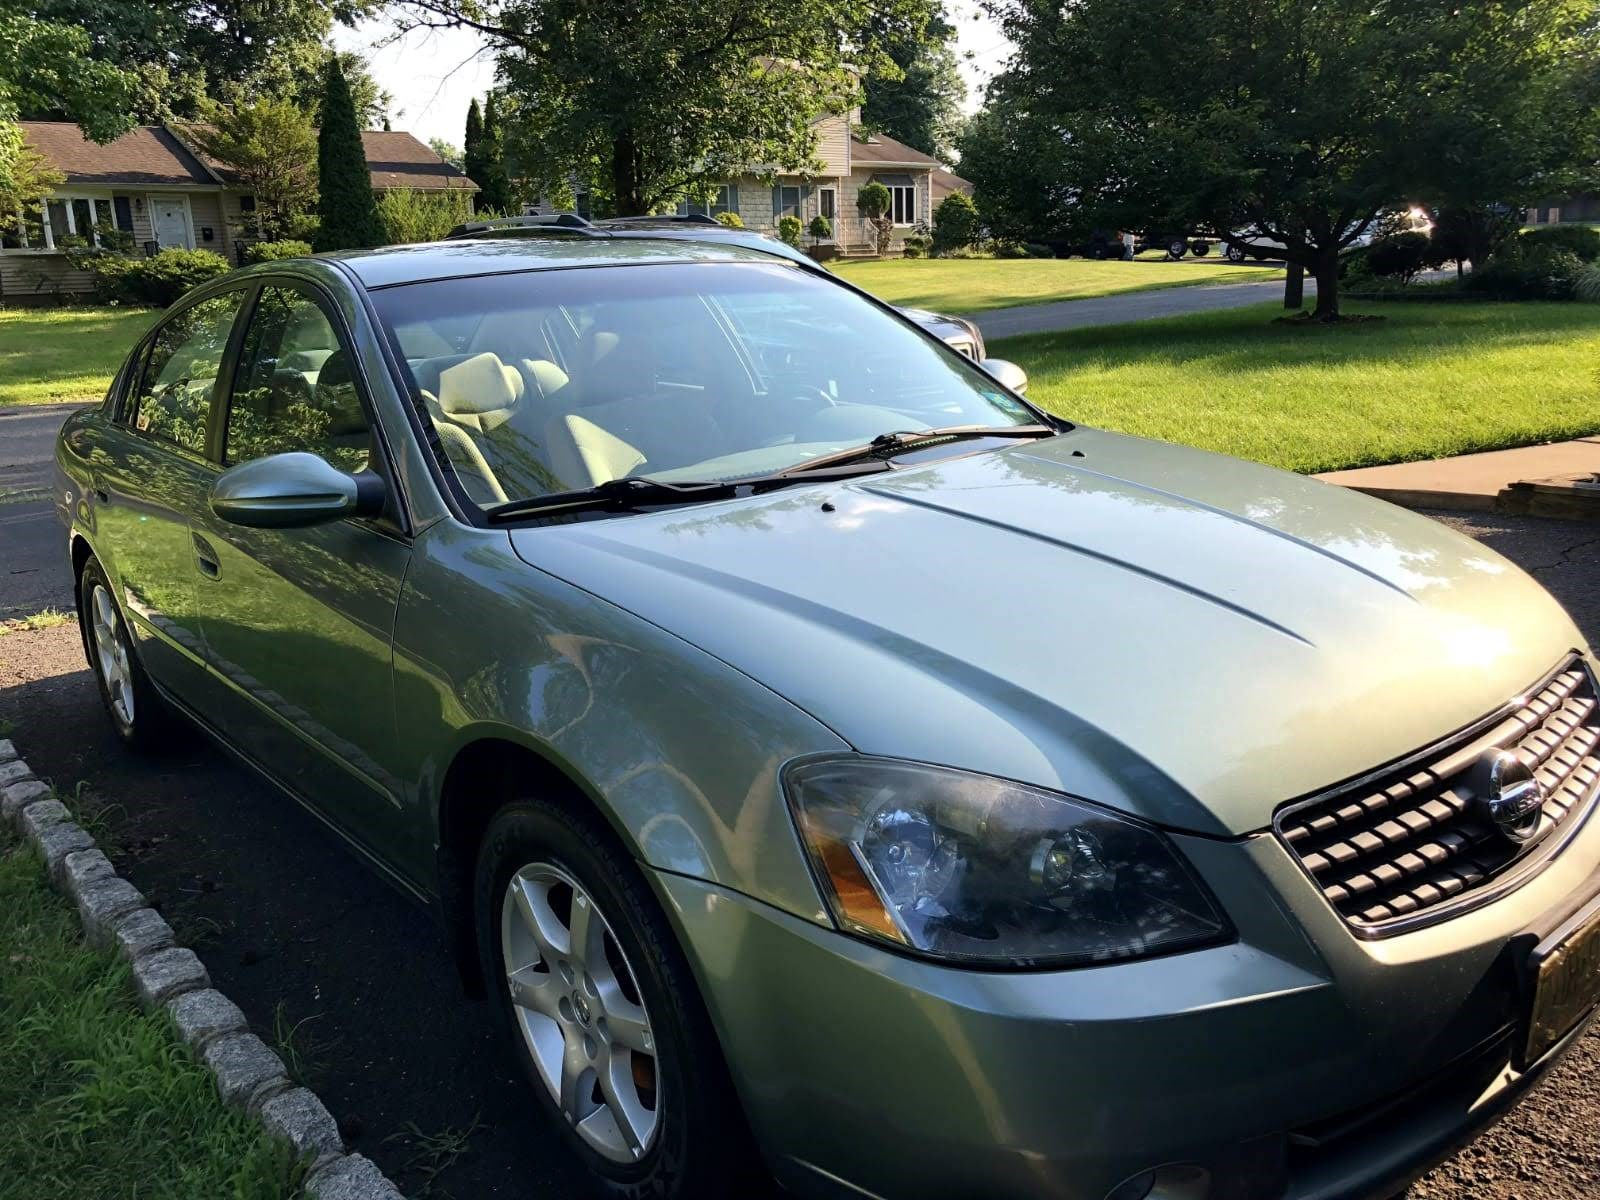 Elegant 2006 Nissan Altima 2.5S Special Edition   $4300.00